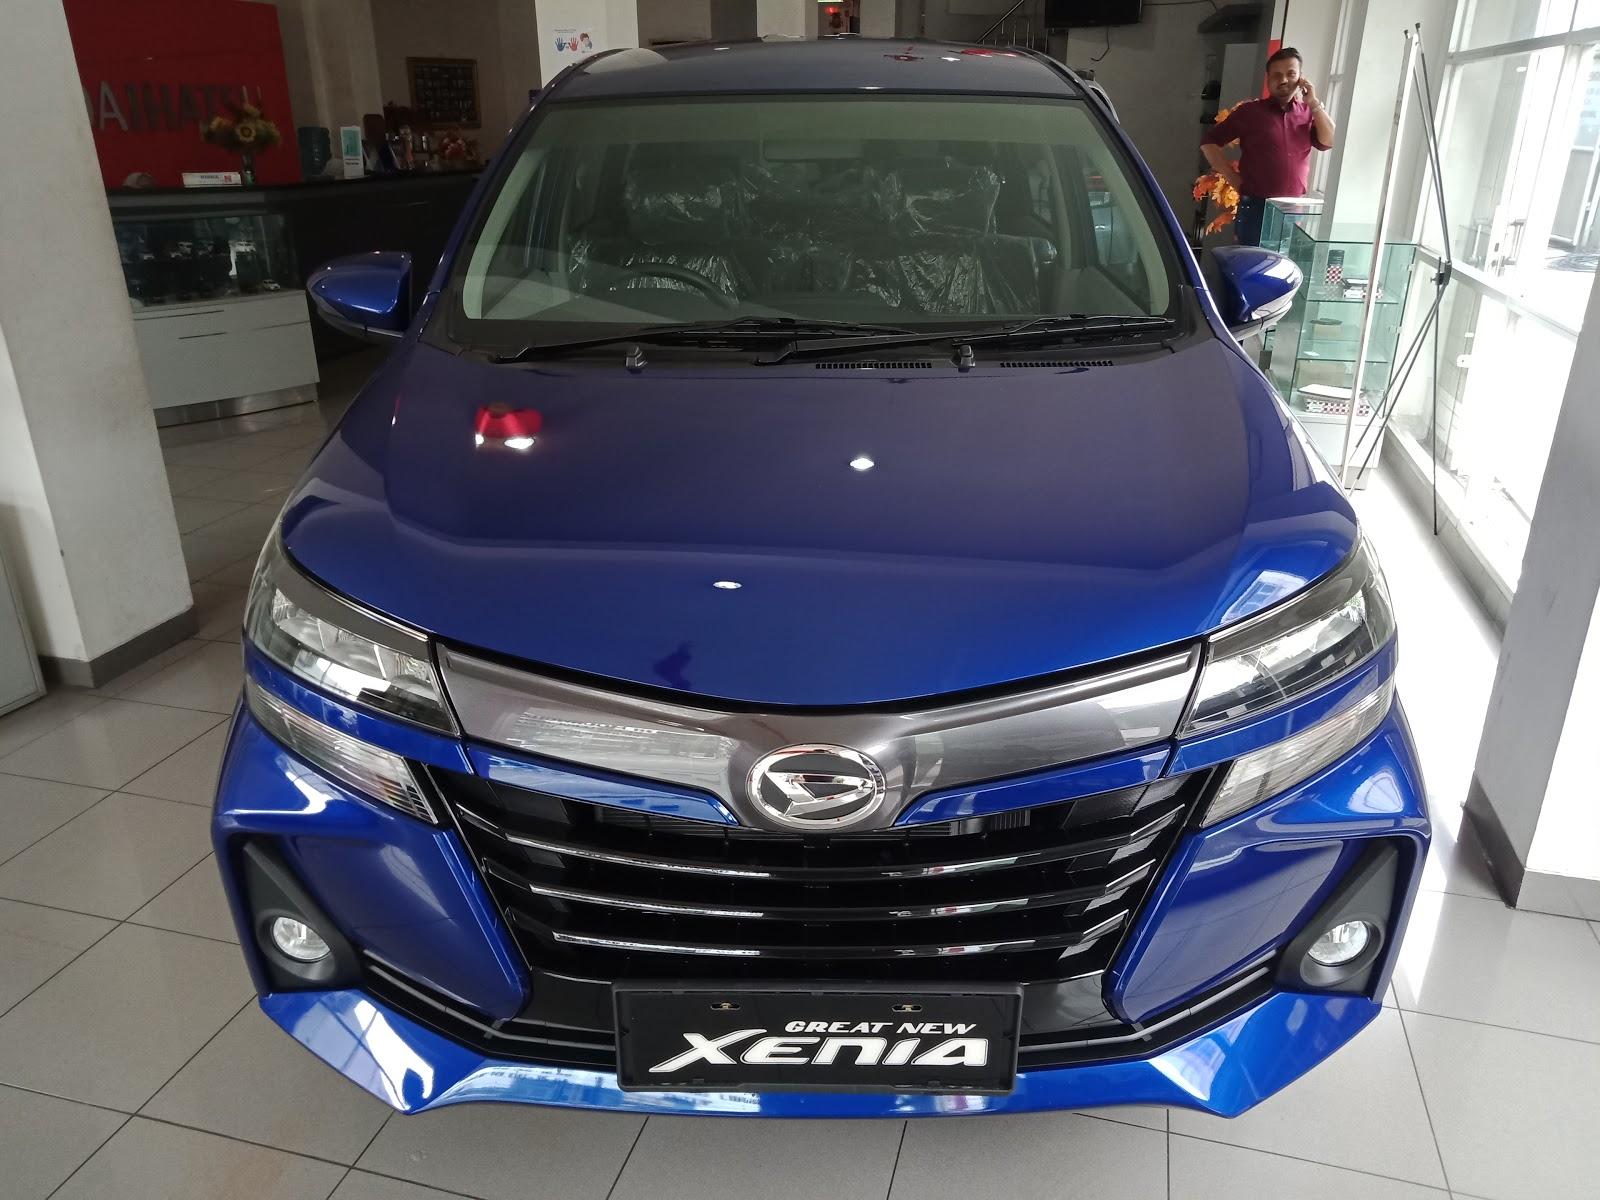 Grand New Avanza E Mt Toyota Yaris Trd Vs Honda Jazz Rs Harga Daihatsu Jakarta Bekasi Tangerang Depok Bogor